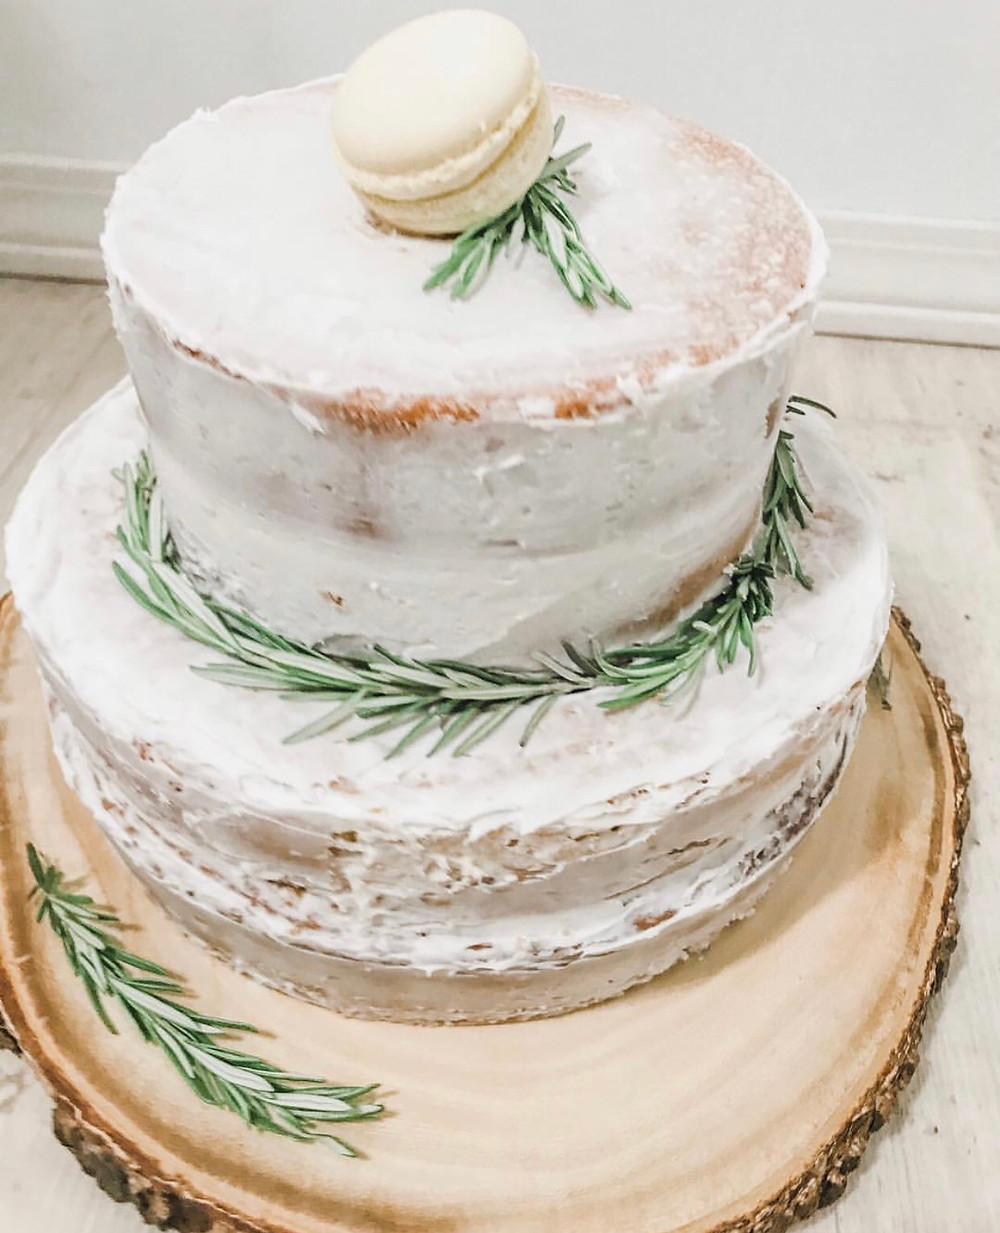 Magnolia | Organic Naked Cake Recipe | Sayidah Dupuis Felsman | Loyola and St. Joseph School Bash | Missoula Photographer | Infinite Photography Missoula